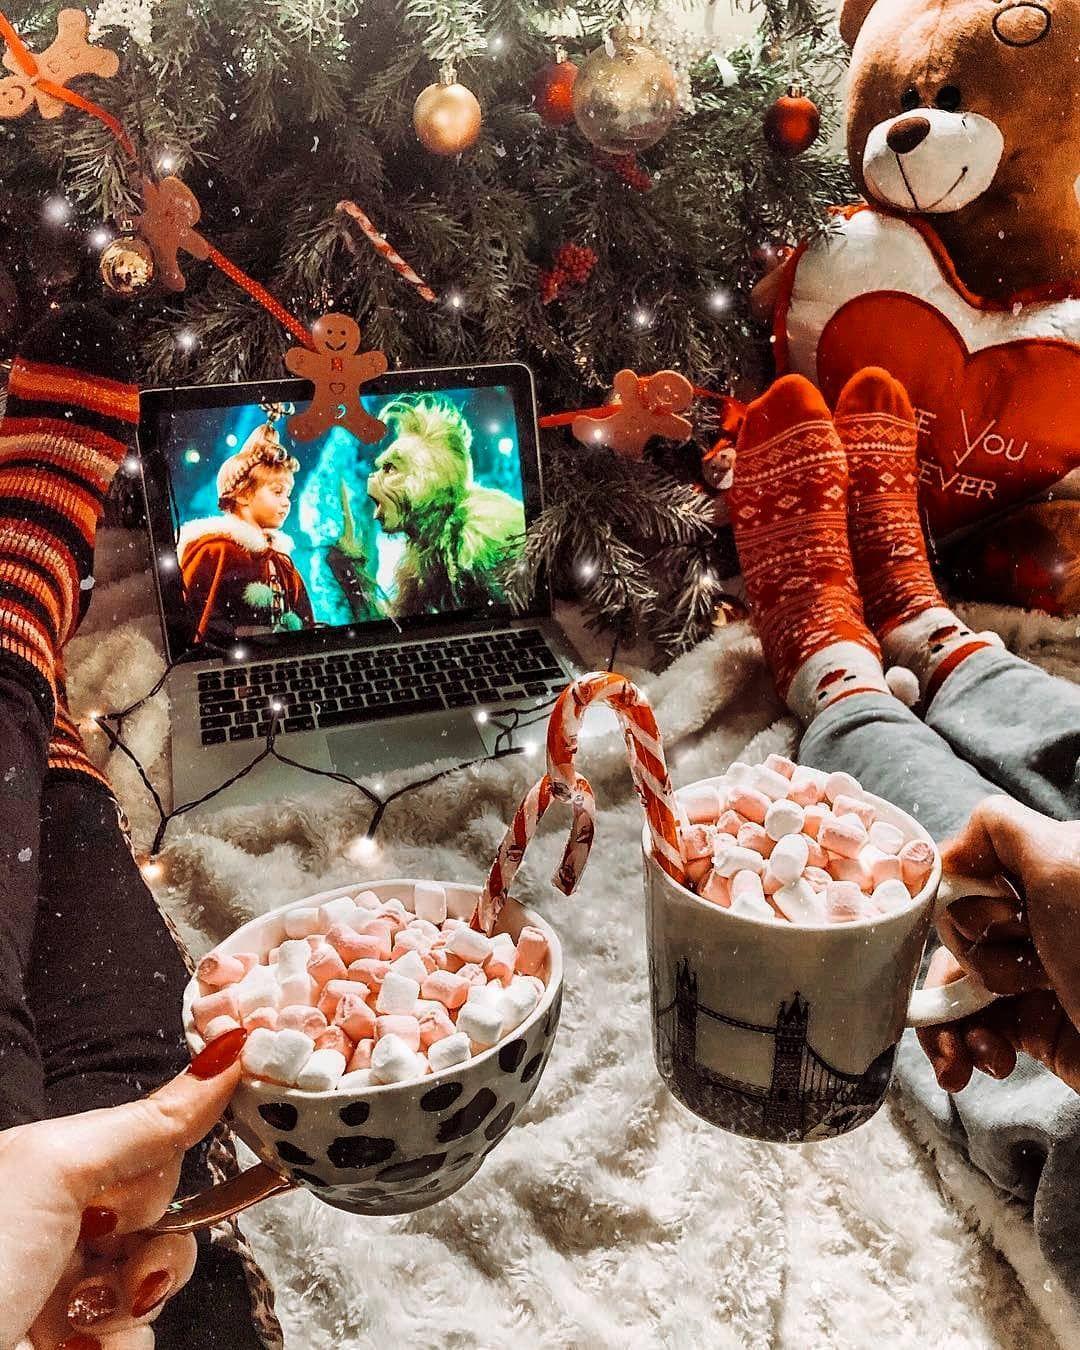 Christmas 2020 On Instagram 156 Days Until Christmas Follow Santaclaaus Hohoho Photo I In 2020 Christmas Feeling Cosy Christmas Cozy Christmas